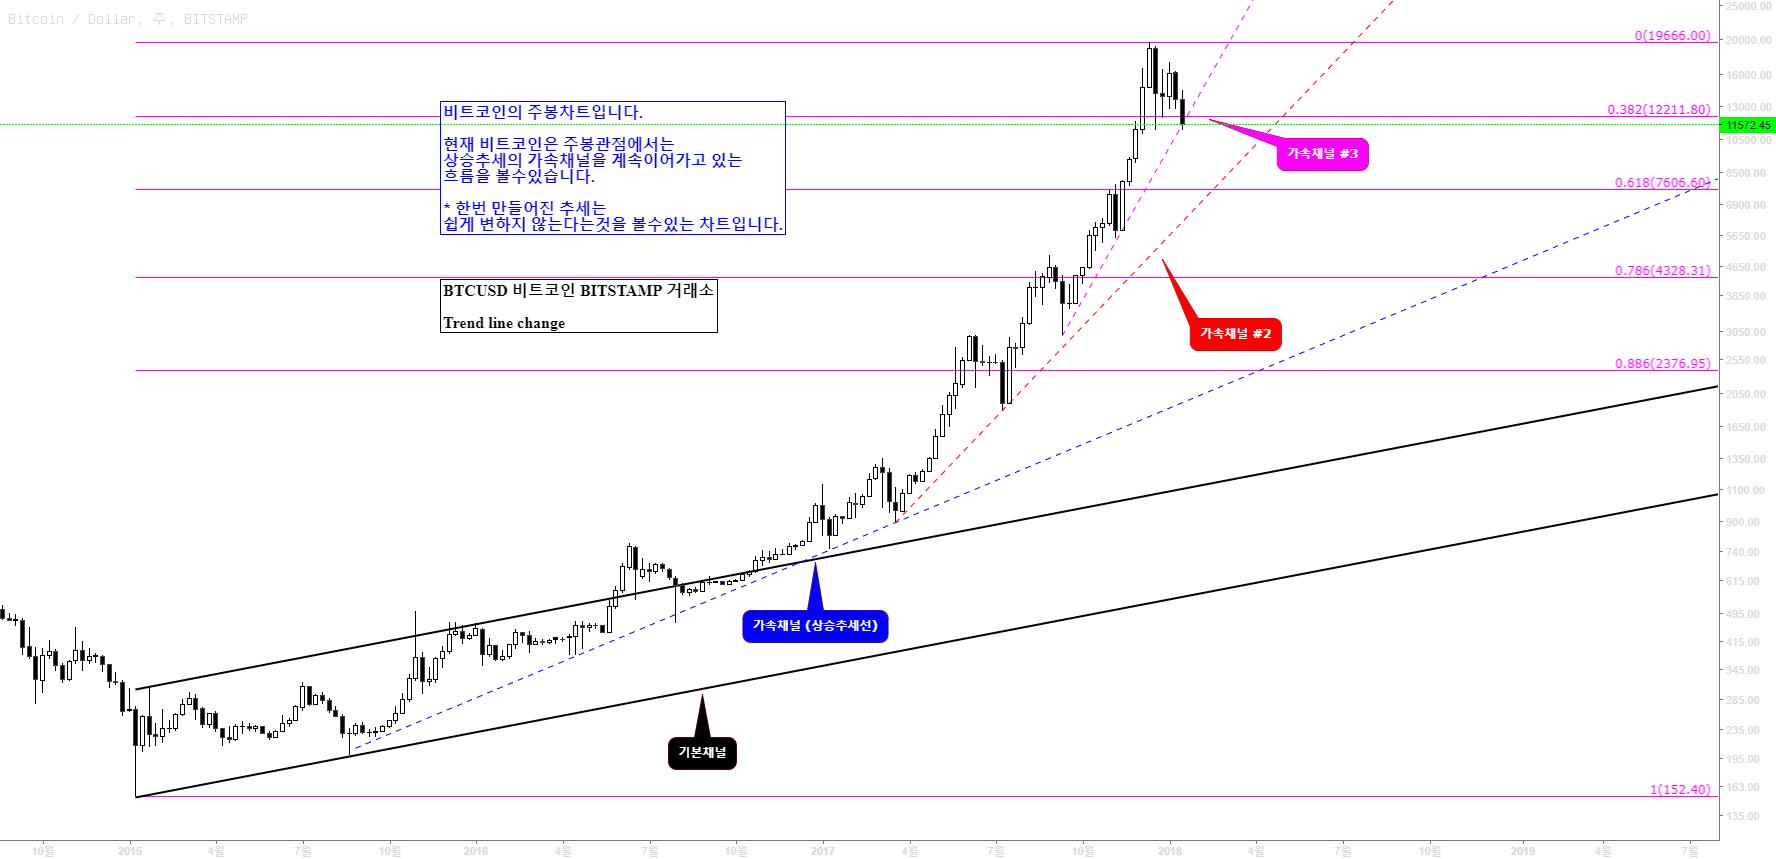 BTCUSD / Bitcoin / 비트코인 차트 패턴 분석 가격대응